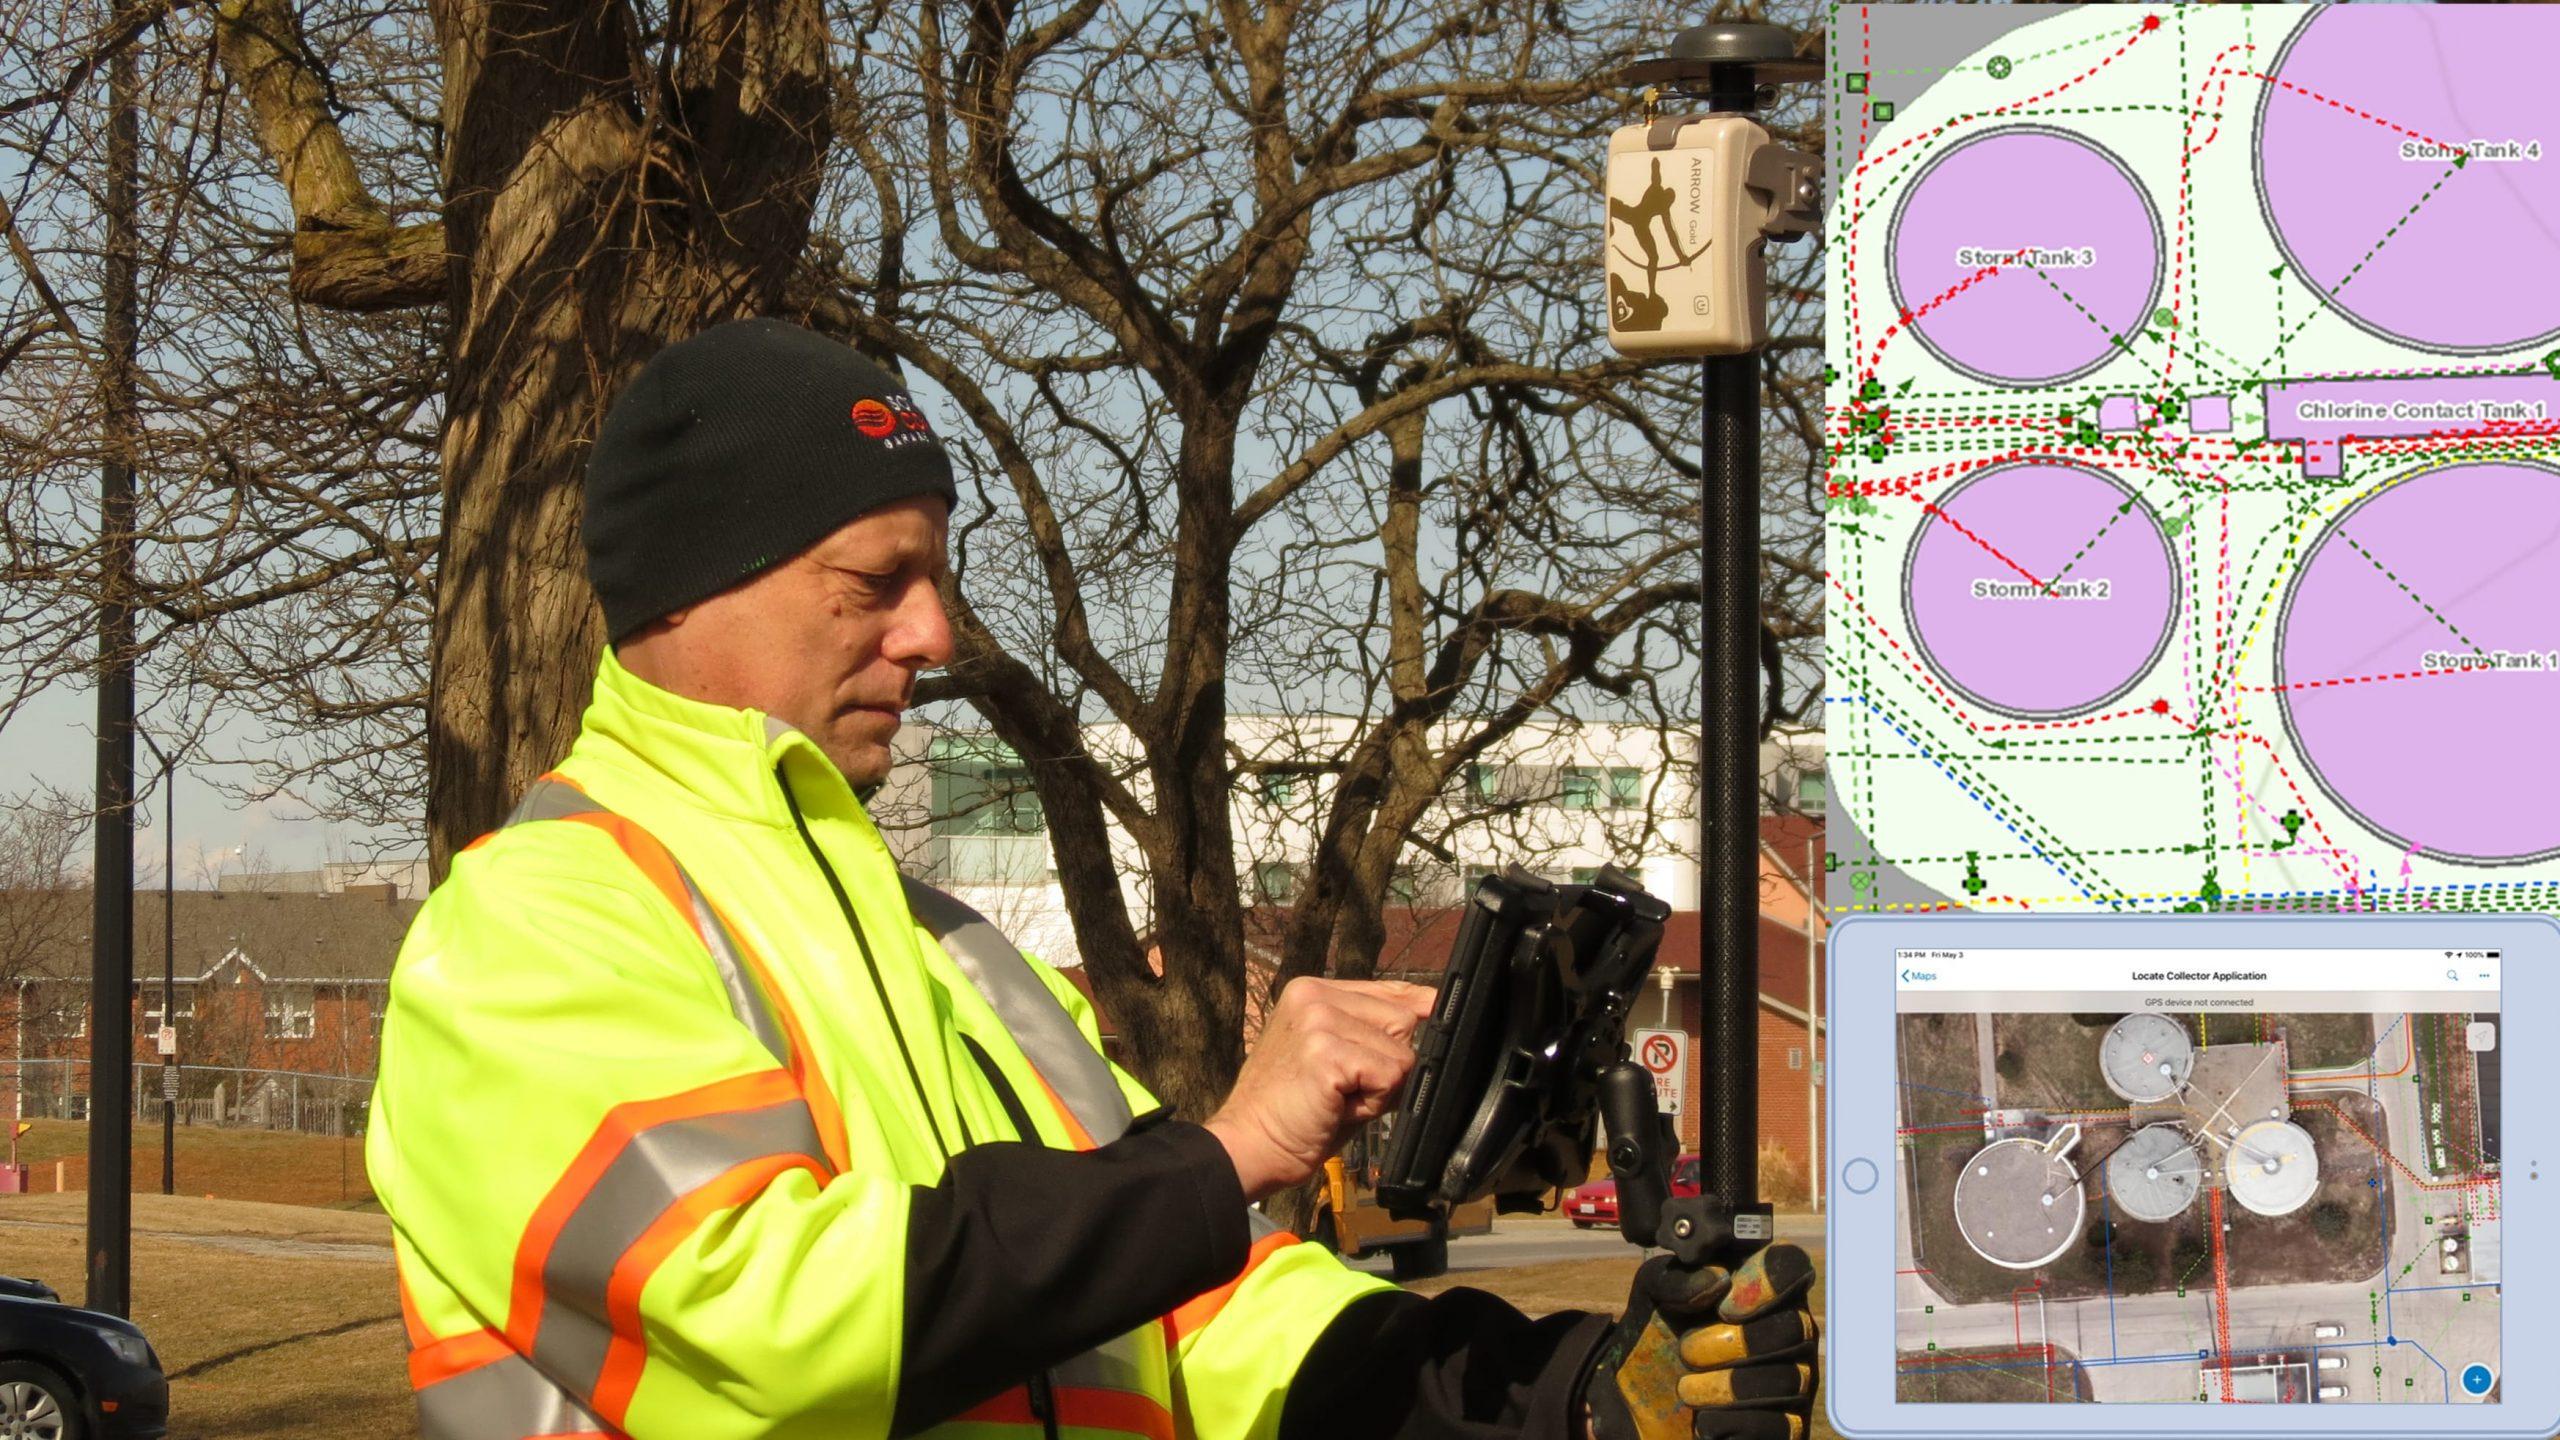 2020 Esri UC - Niagara Region Collector locates composite